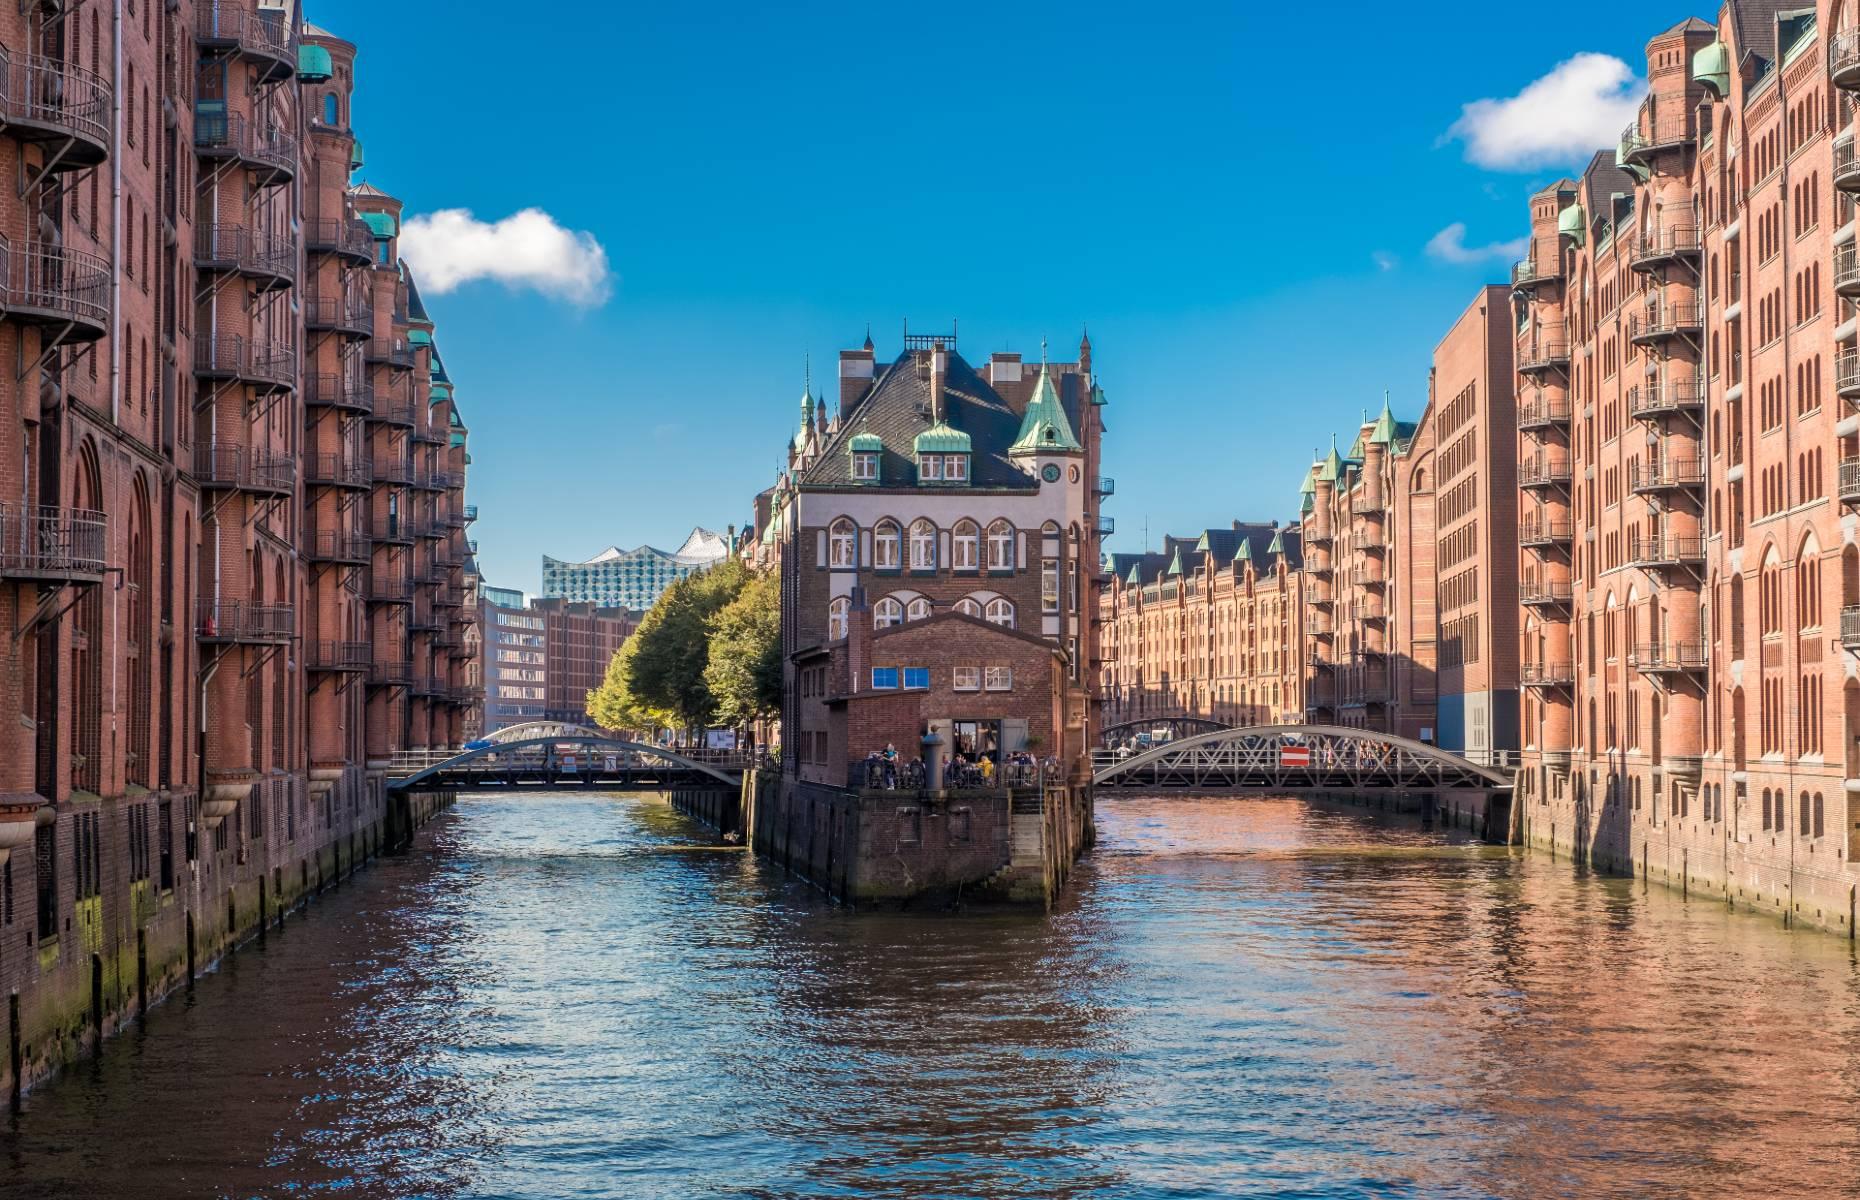 Speicherstadt, Hamburg, Germany (Credit: JohanMorin/Shutterstock)